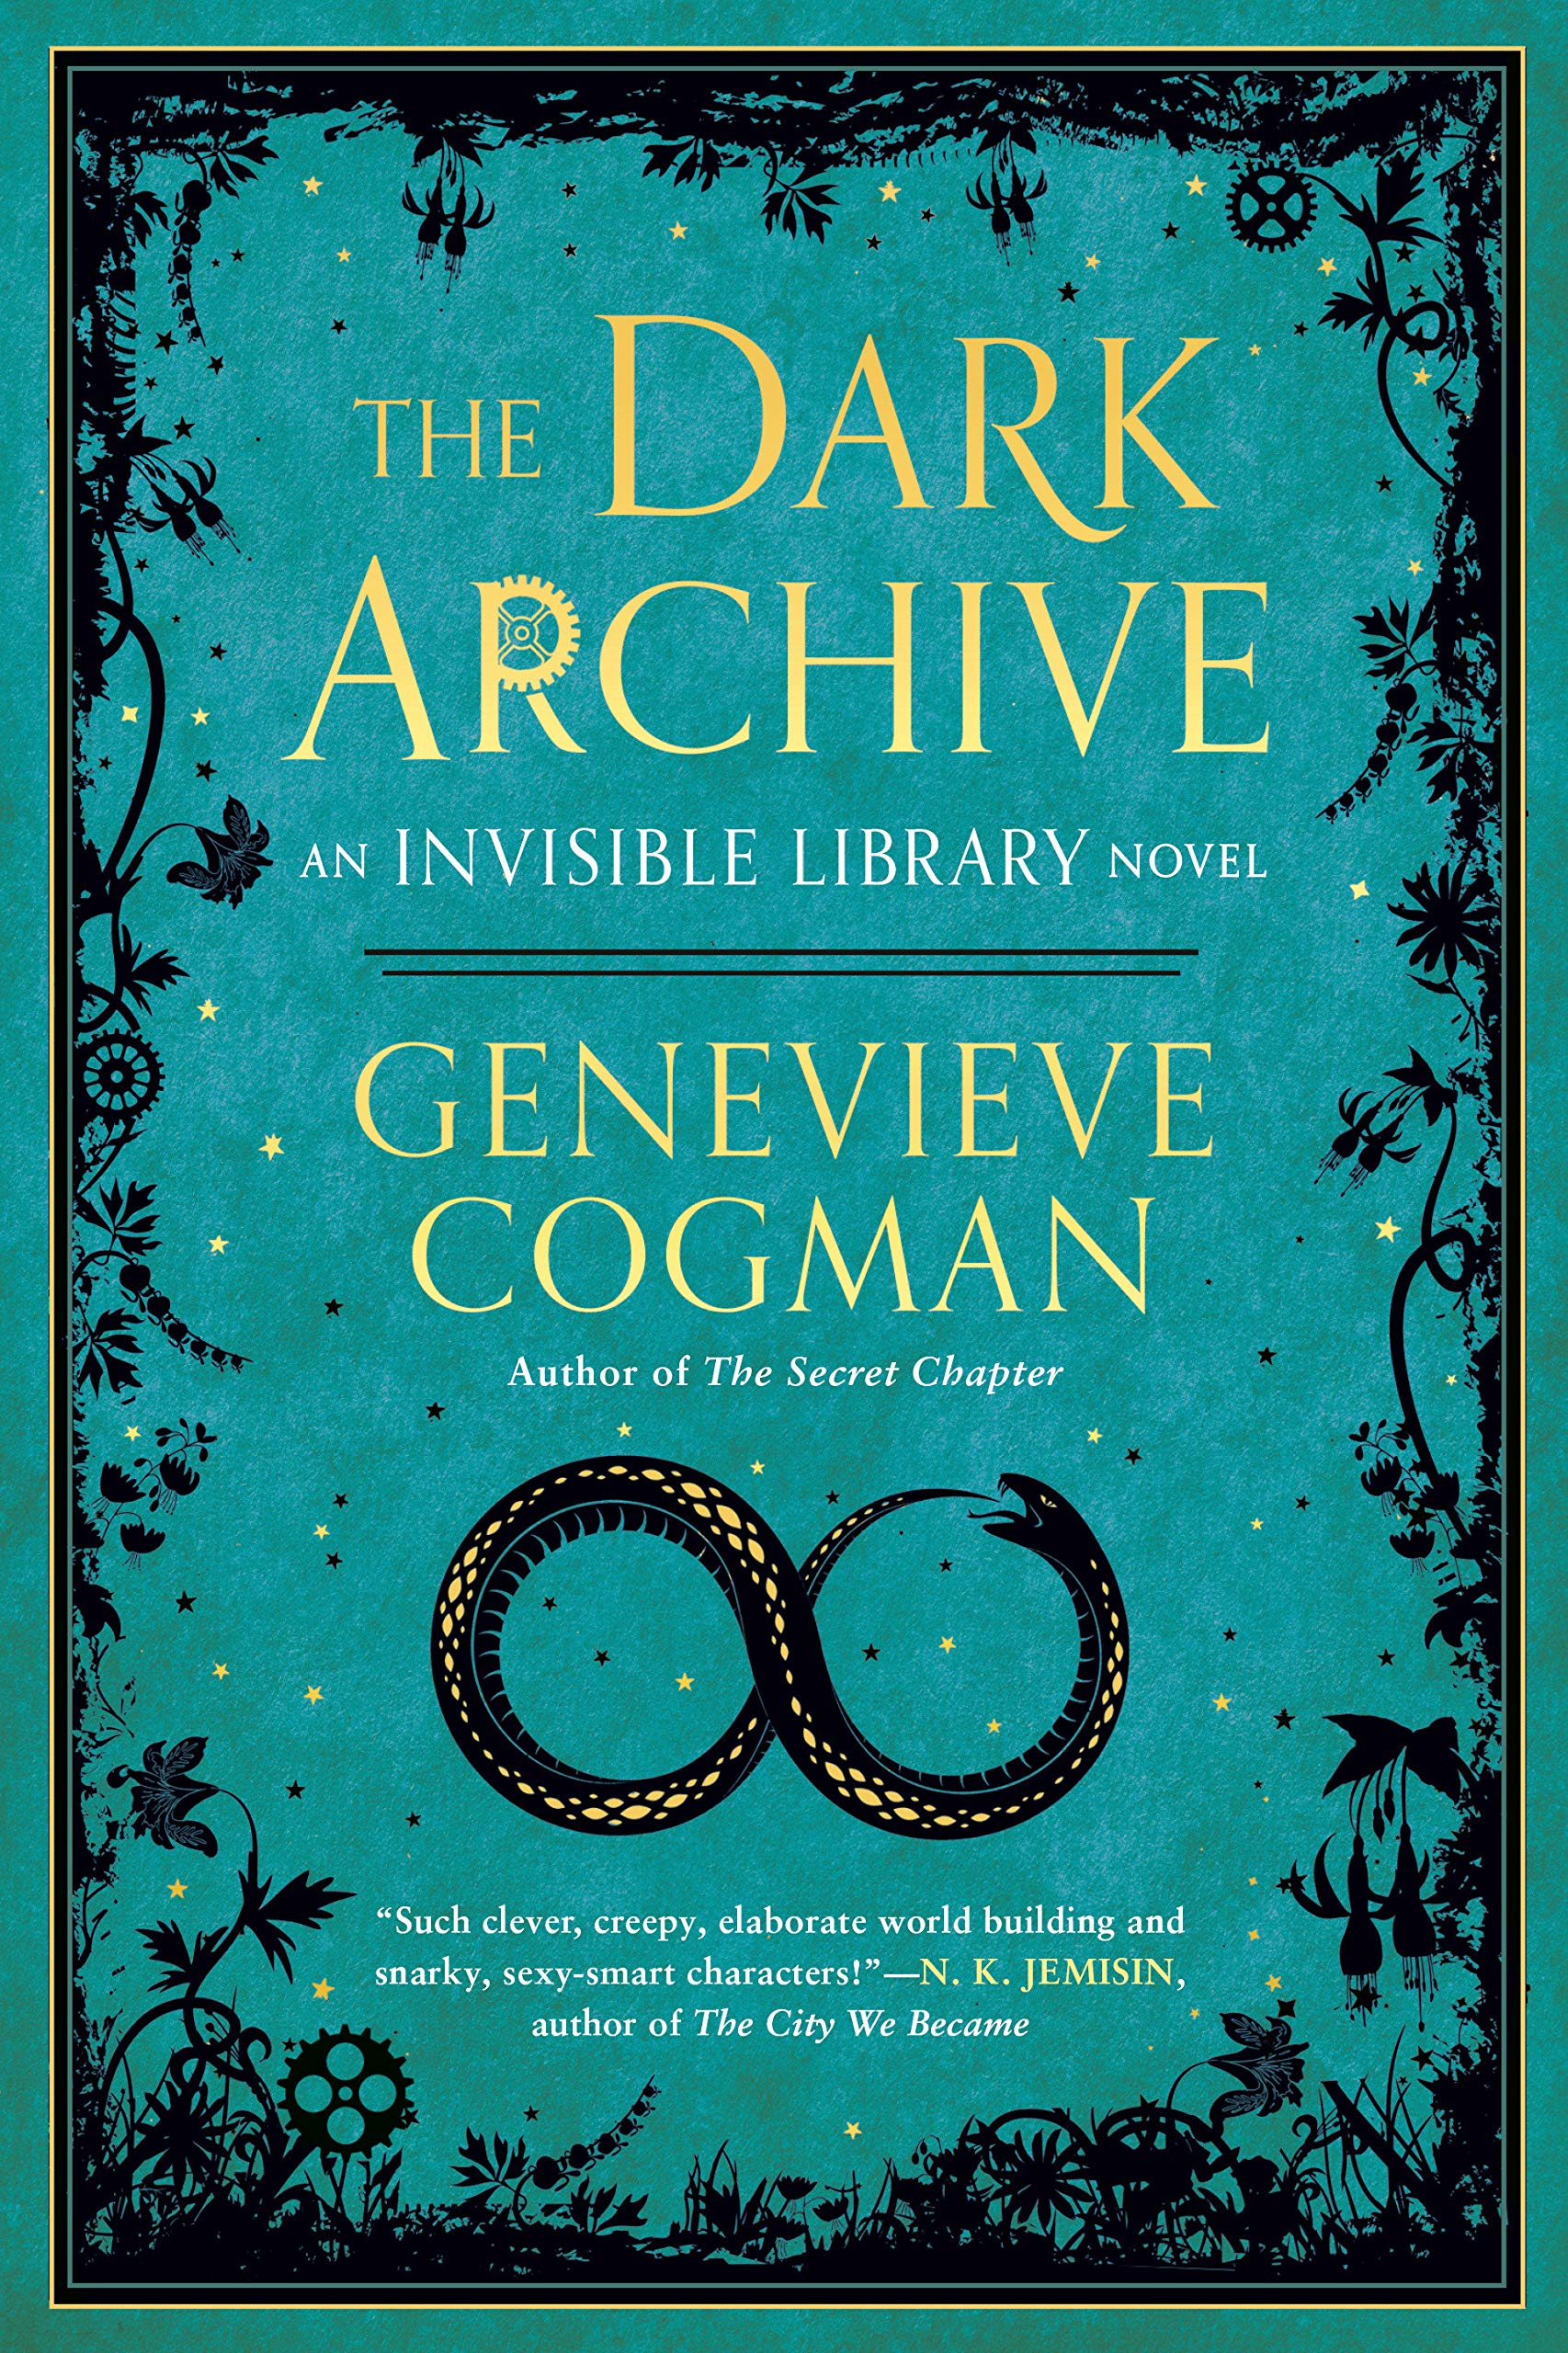 The Dark Archive : Cogman, Genevieve: Amazon.ca: Books